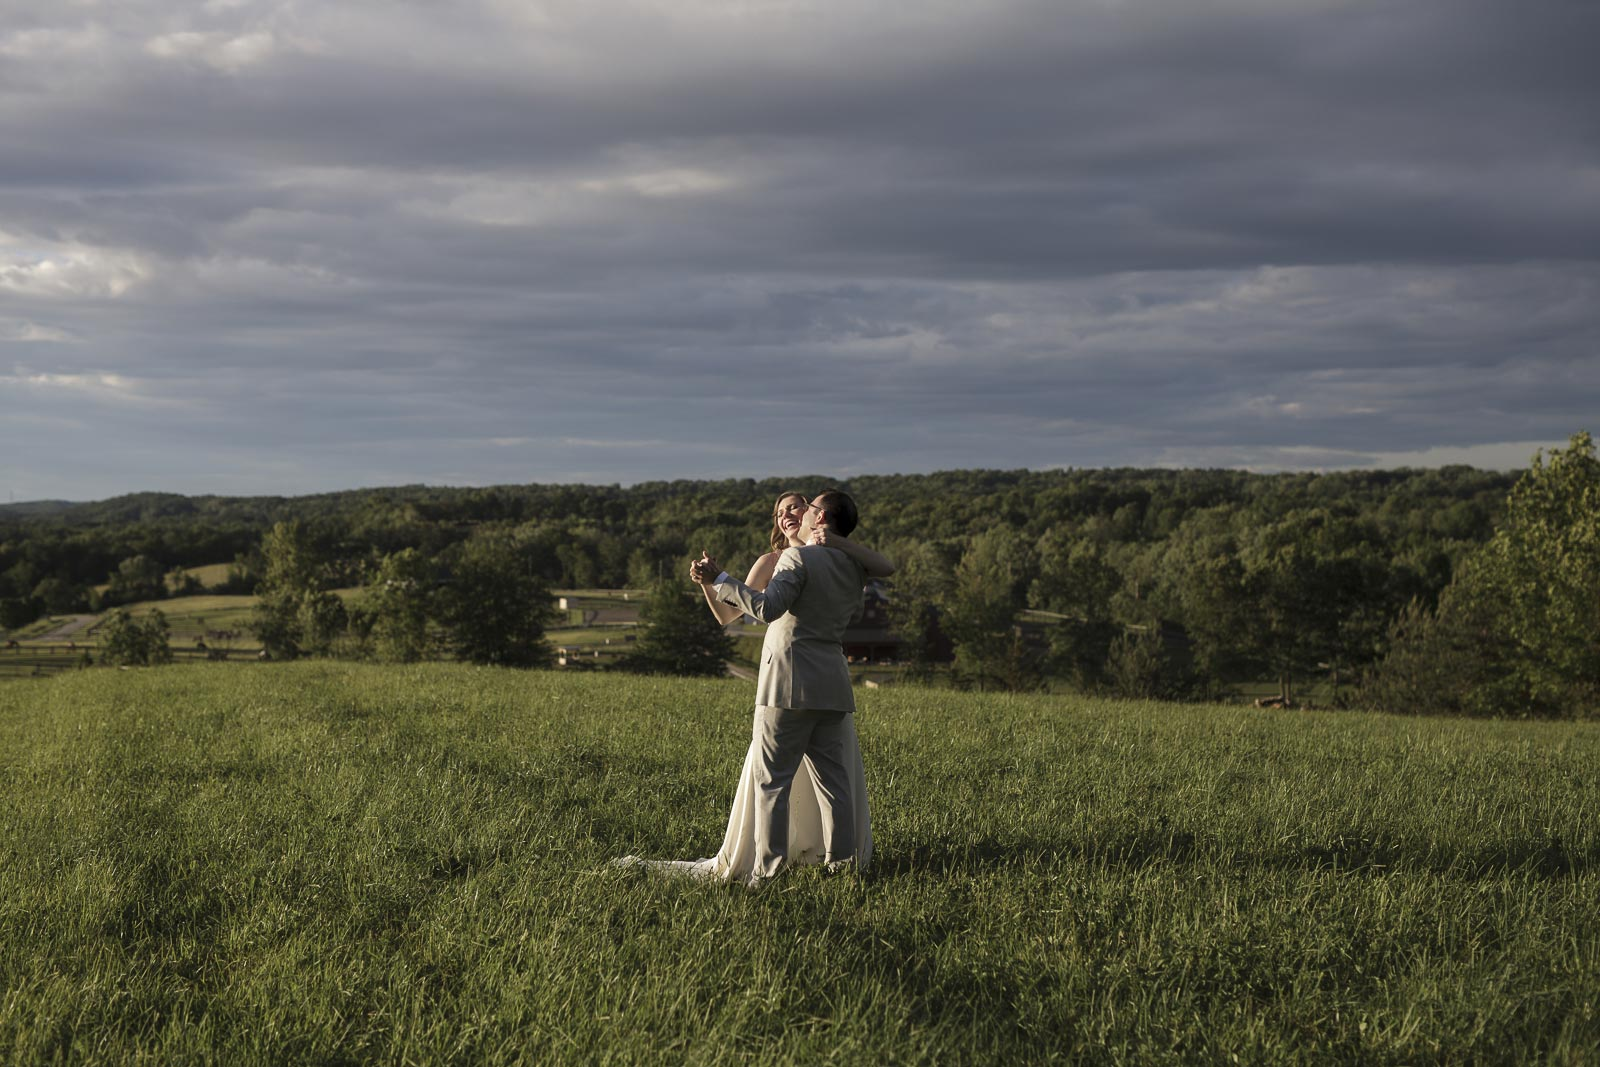 barn-at-liberty-farms-wedding-hudson-valley-alekseyk-photography-61.jpg